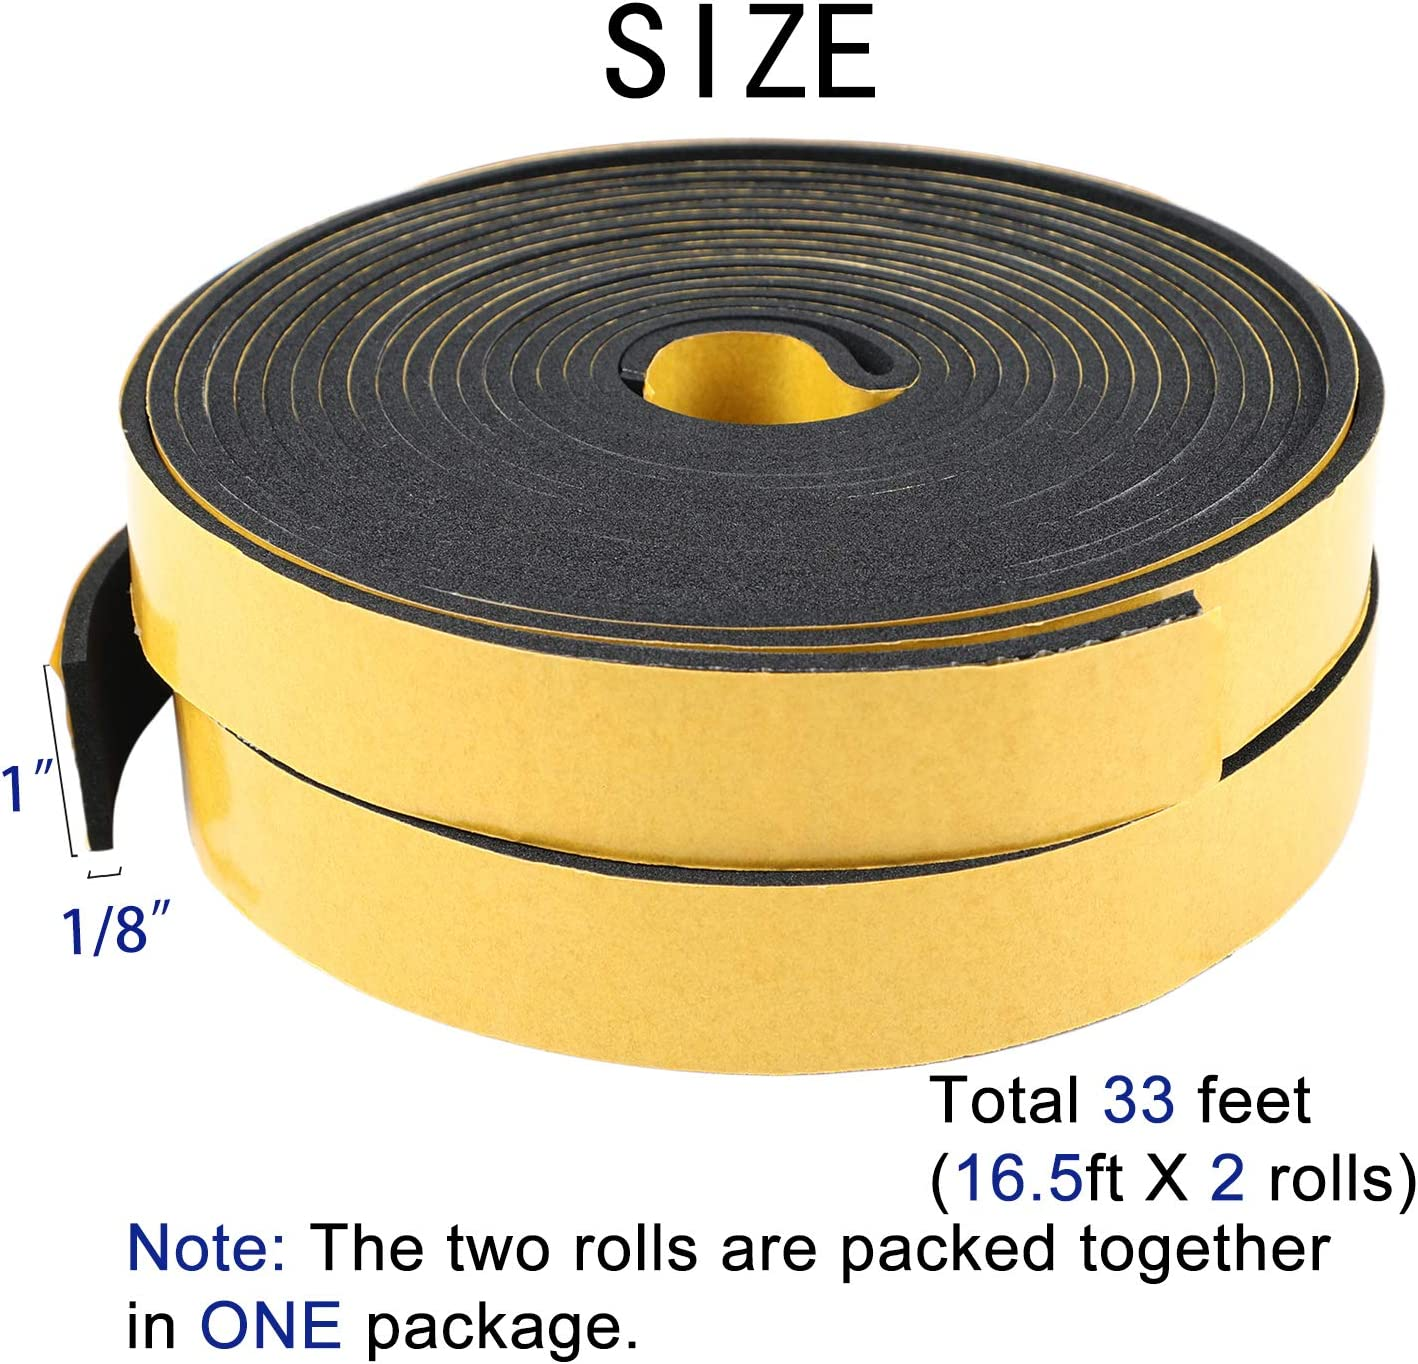 USA Sealing Inc.-Fire Retardant Neoprene Foam with Adhesive-1//8T x 3//8W x 10 ft.